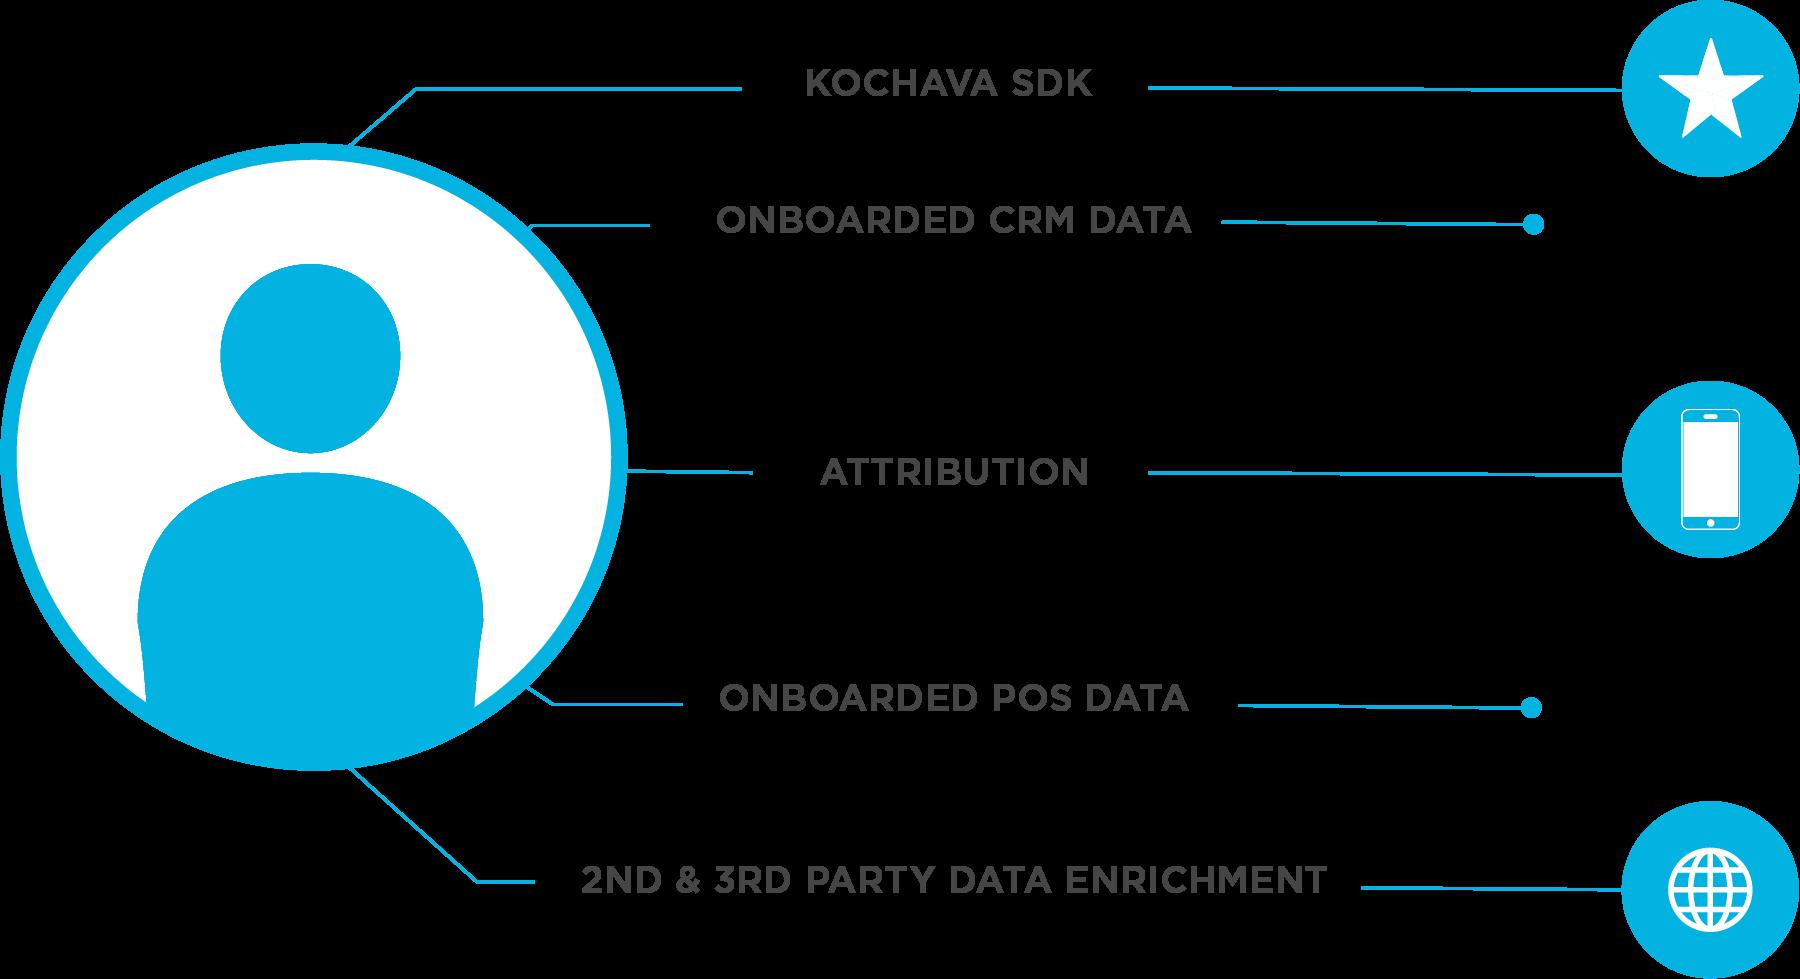 Identity resolution with Kochava IdentityLinks